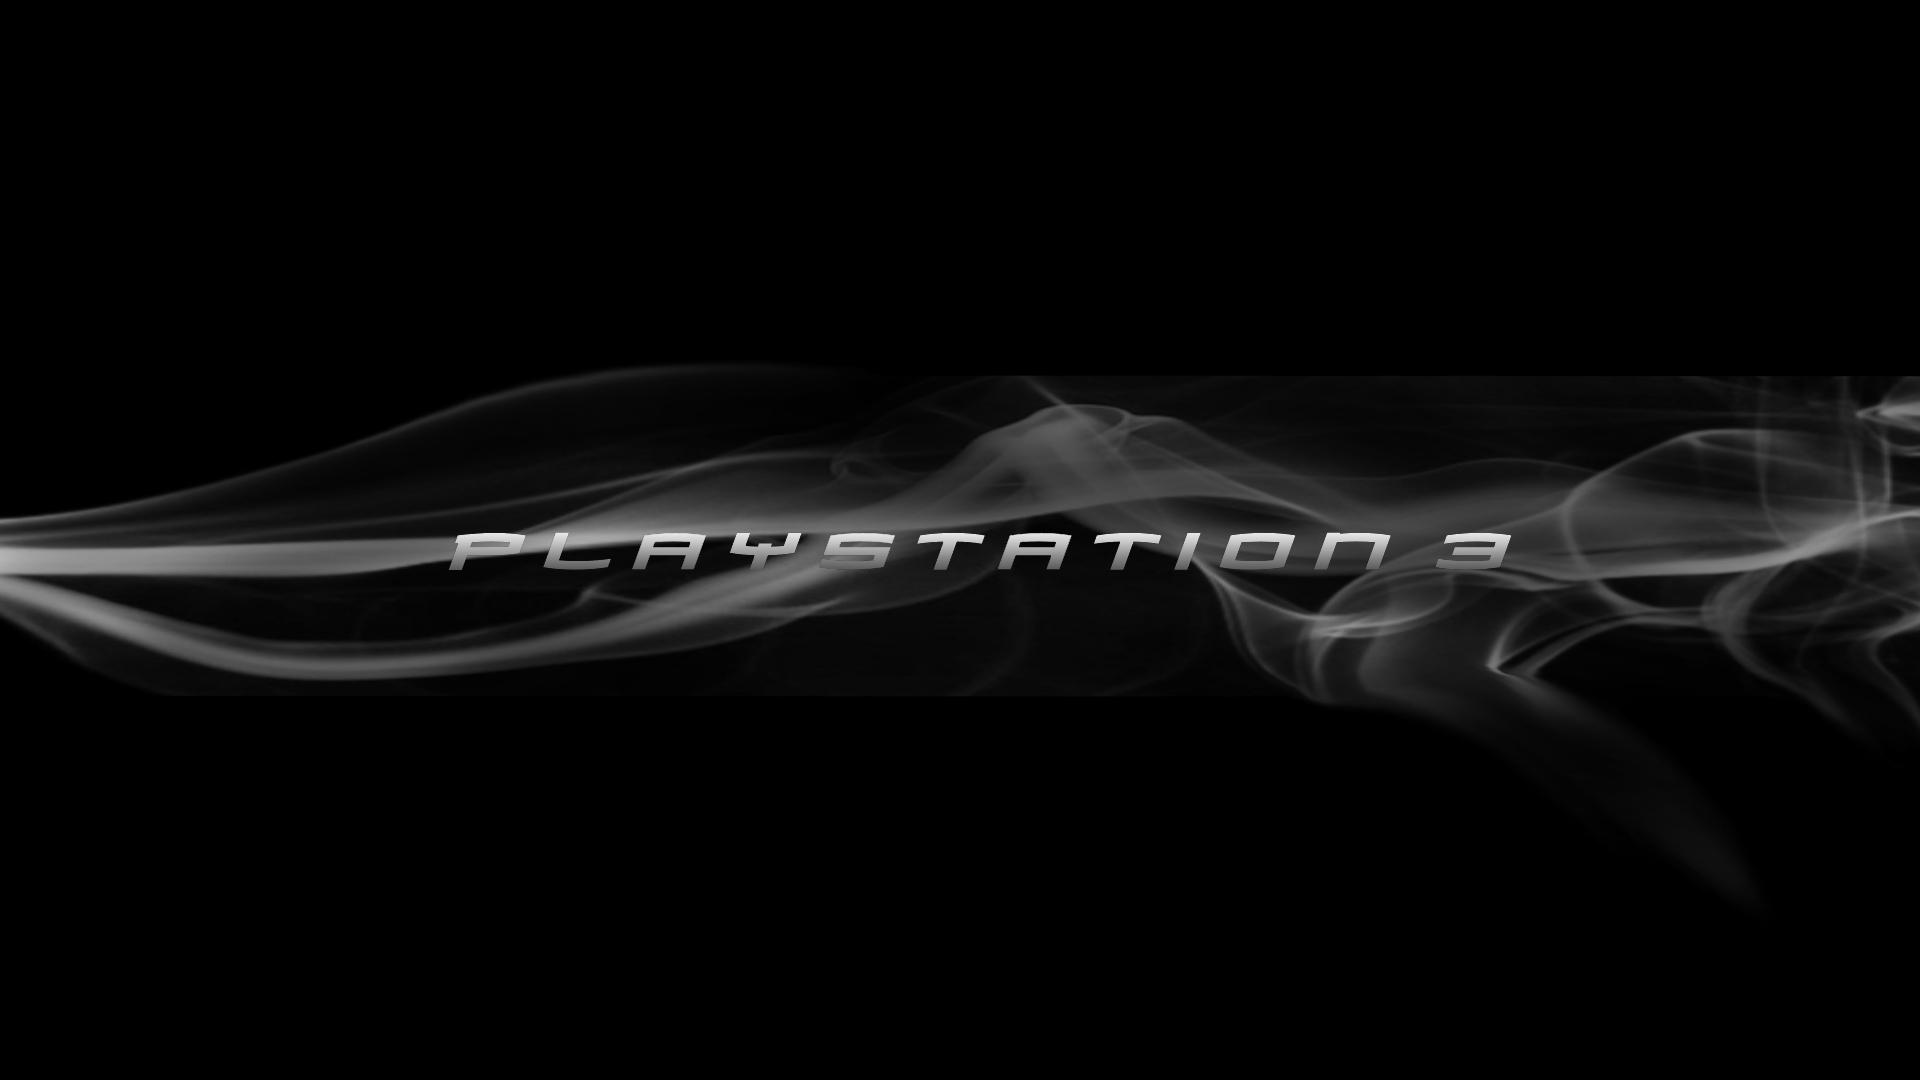 Playstation 3 Wallpaper · Playstation 3 Wallpaper ...